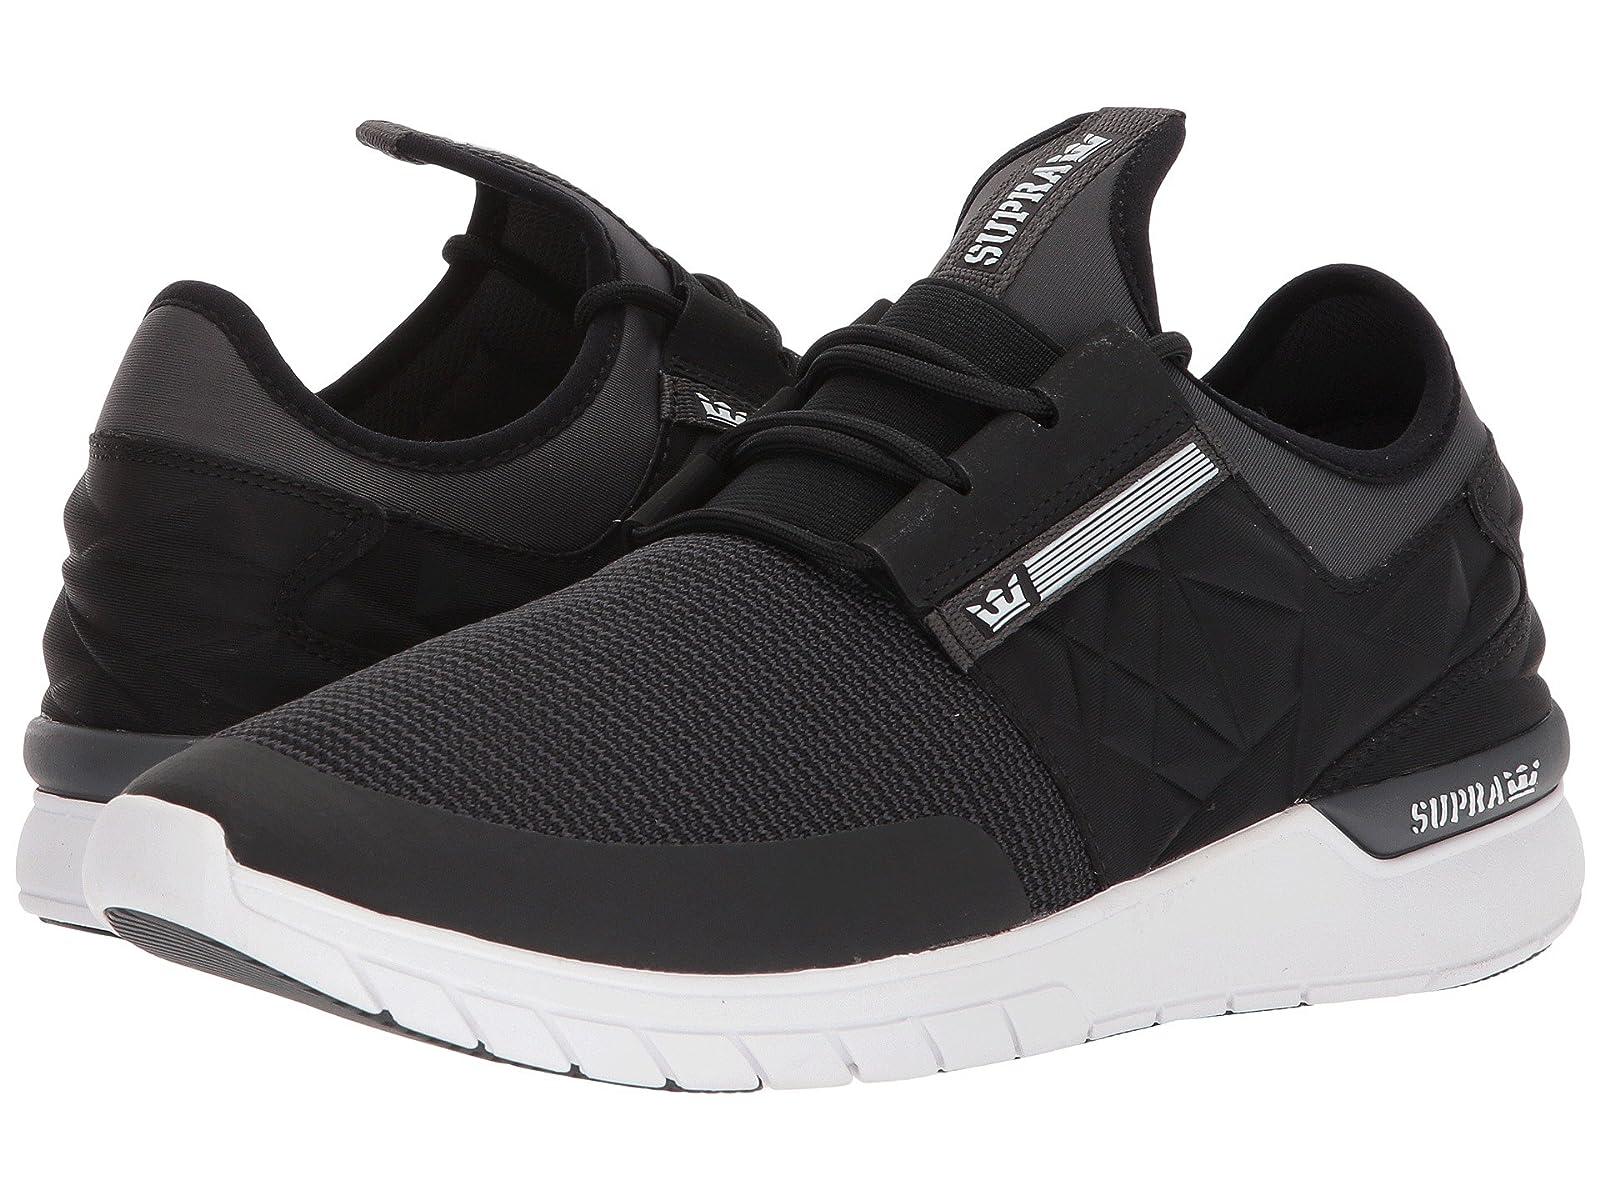 Supra Flow Run EvoCheap and distinctive eye-catching shoes